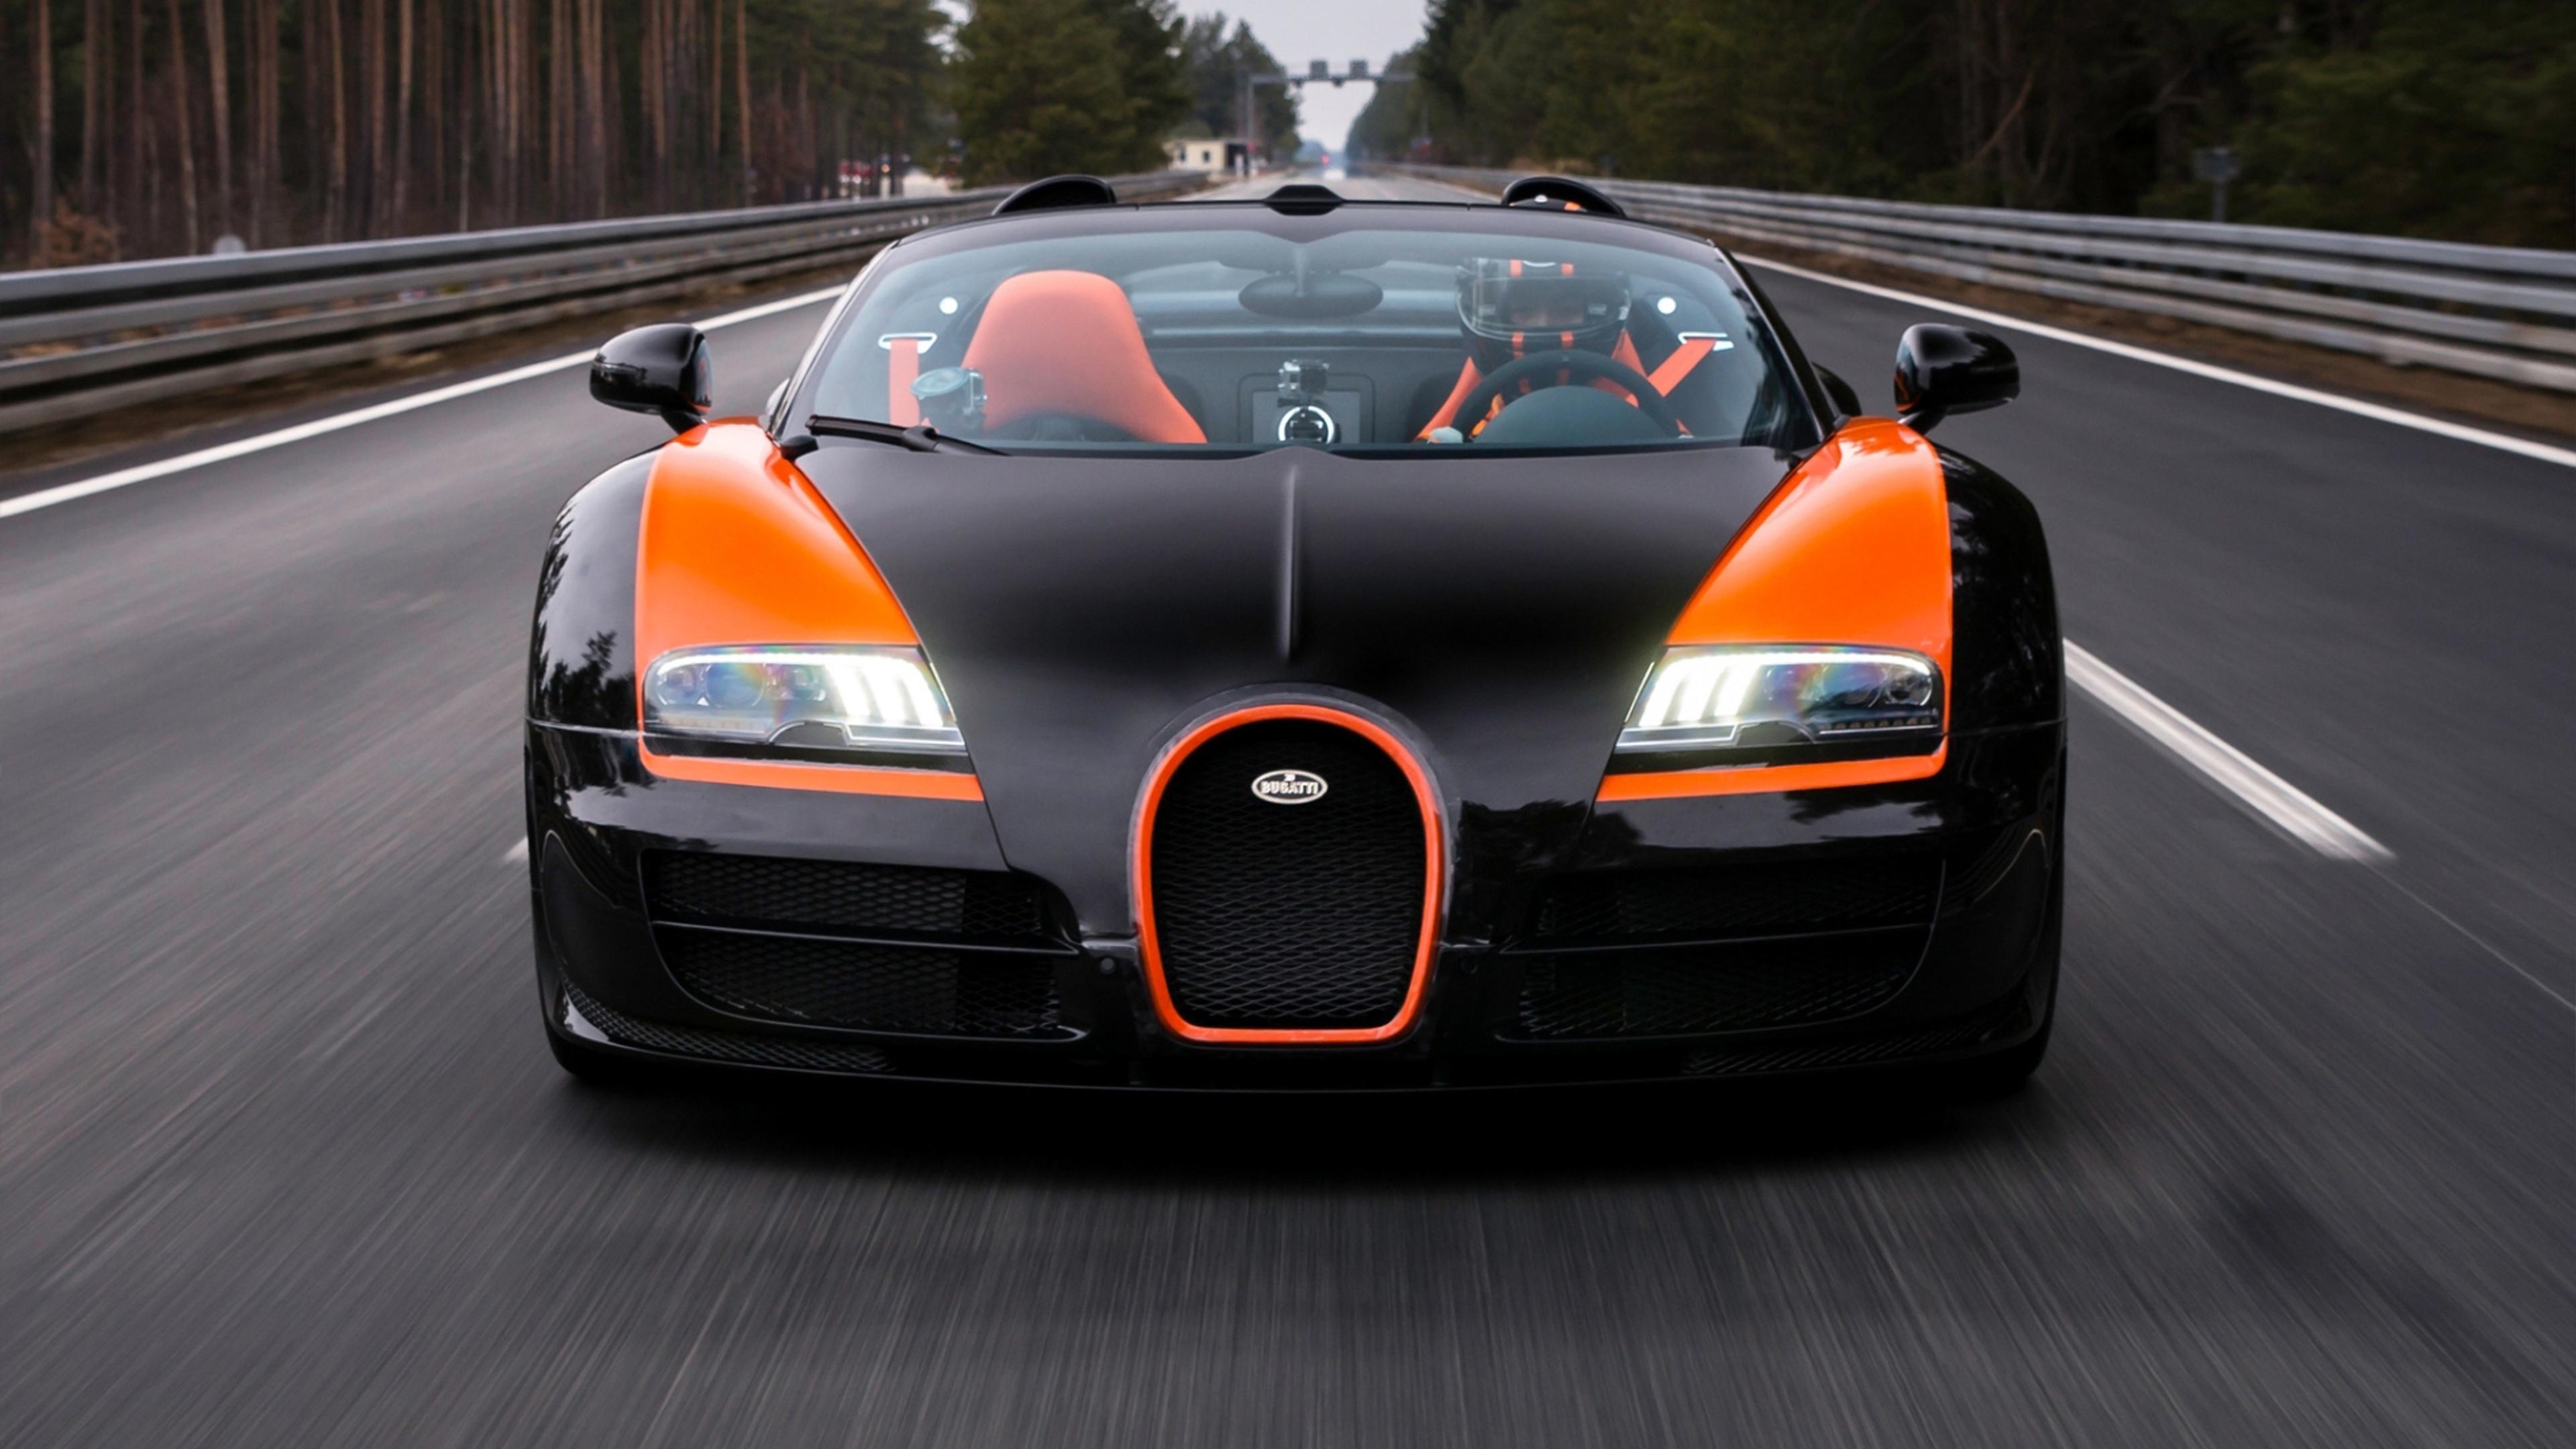 Bugatti Veyron Grand Sport HD Wallpaper Download 3840x2160